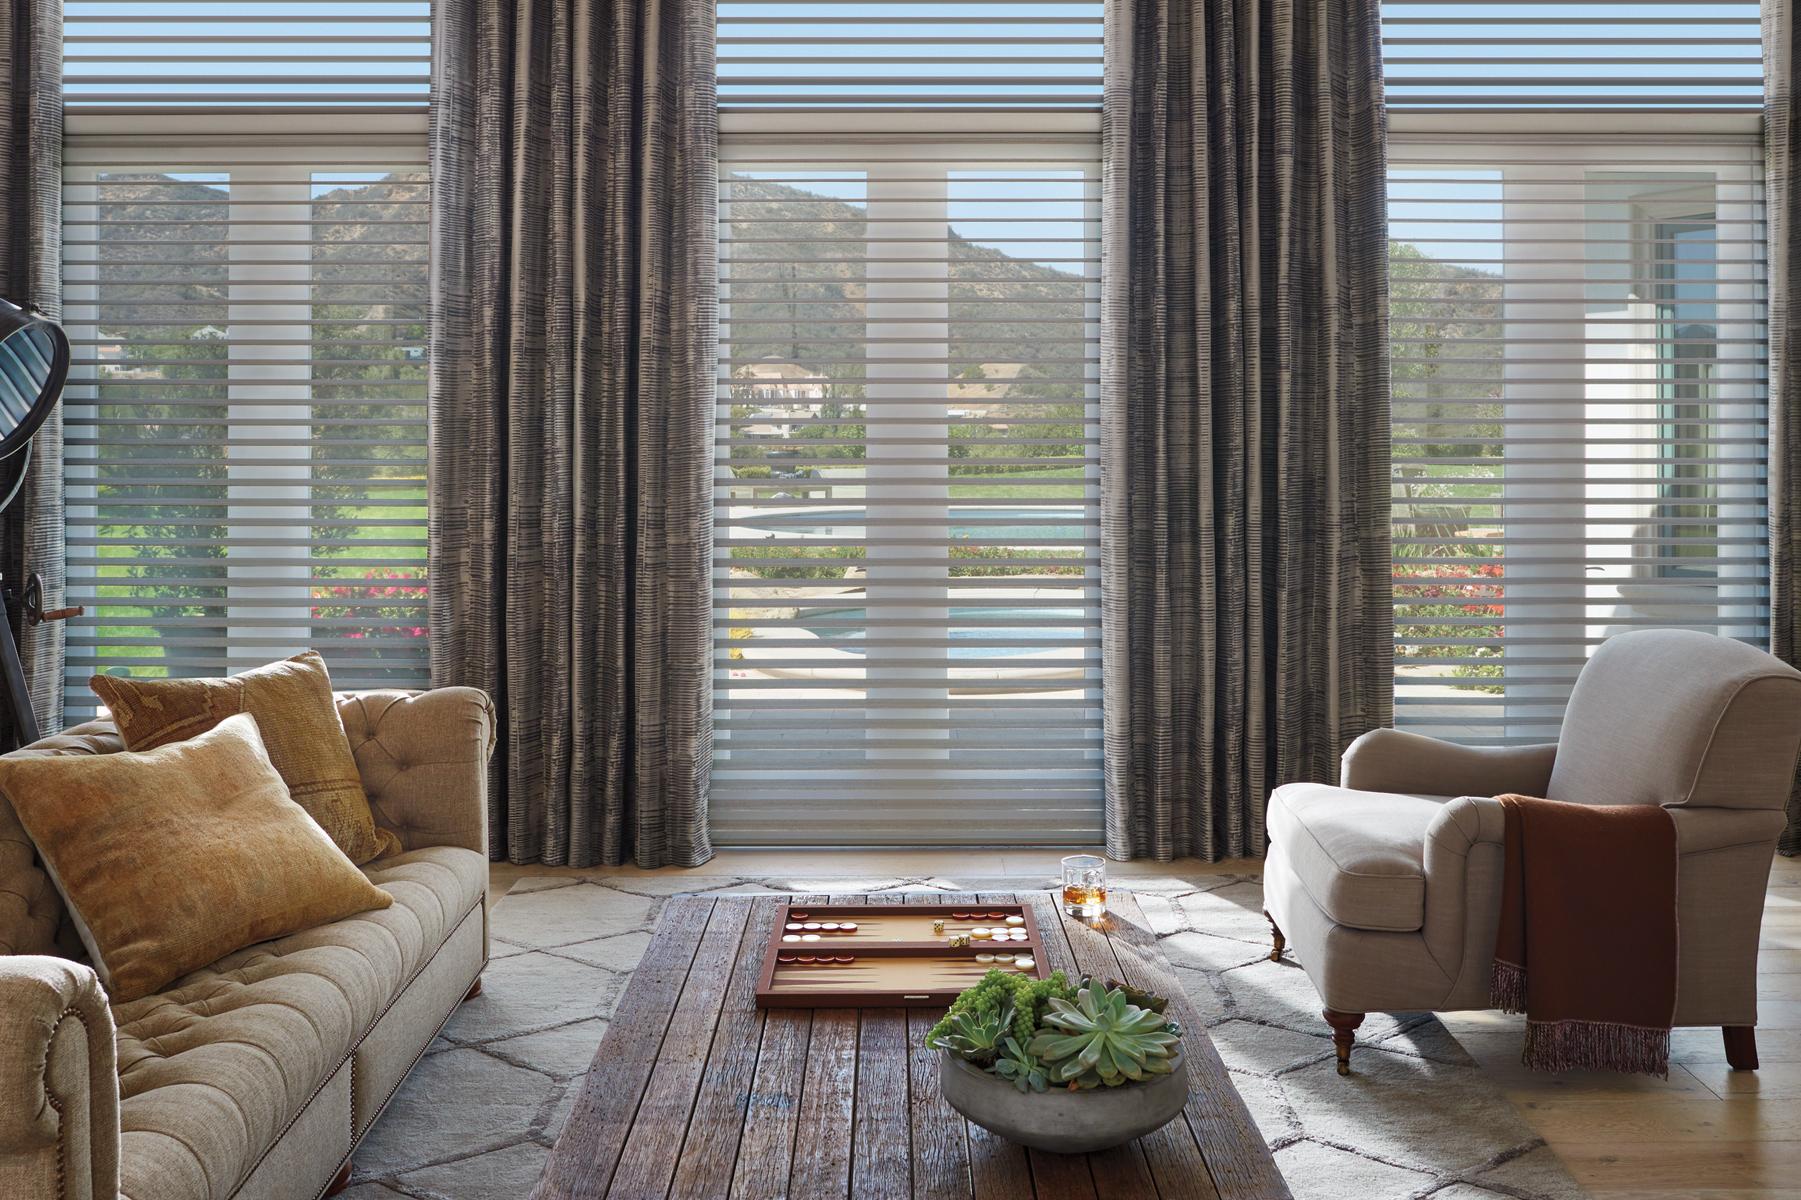 floor to ceiling large windows hunter douglas motorized blinds rocky river 44116 - Hunter Douglas Motorized Blinds